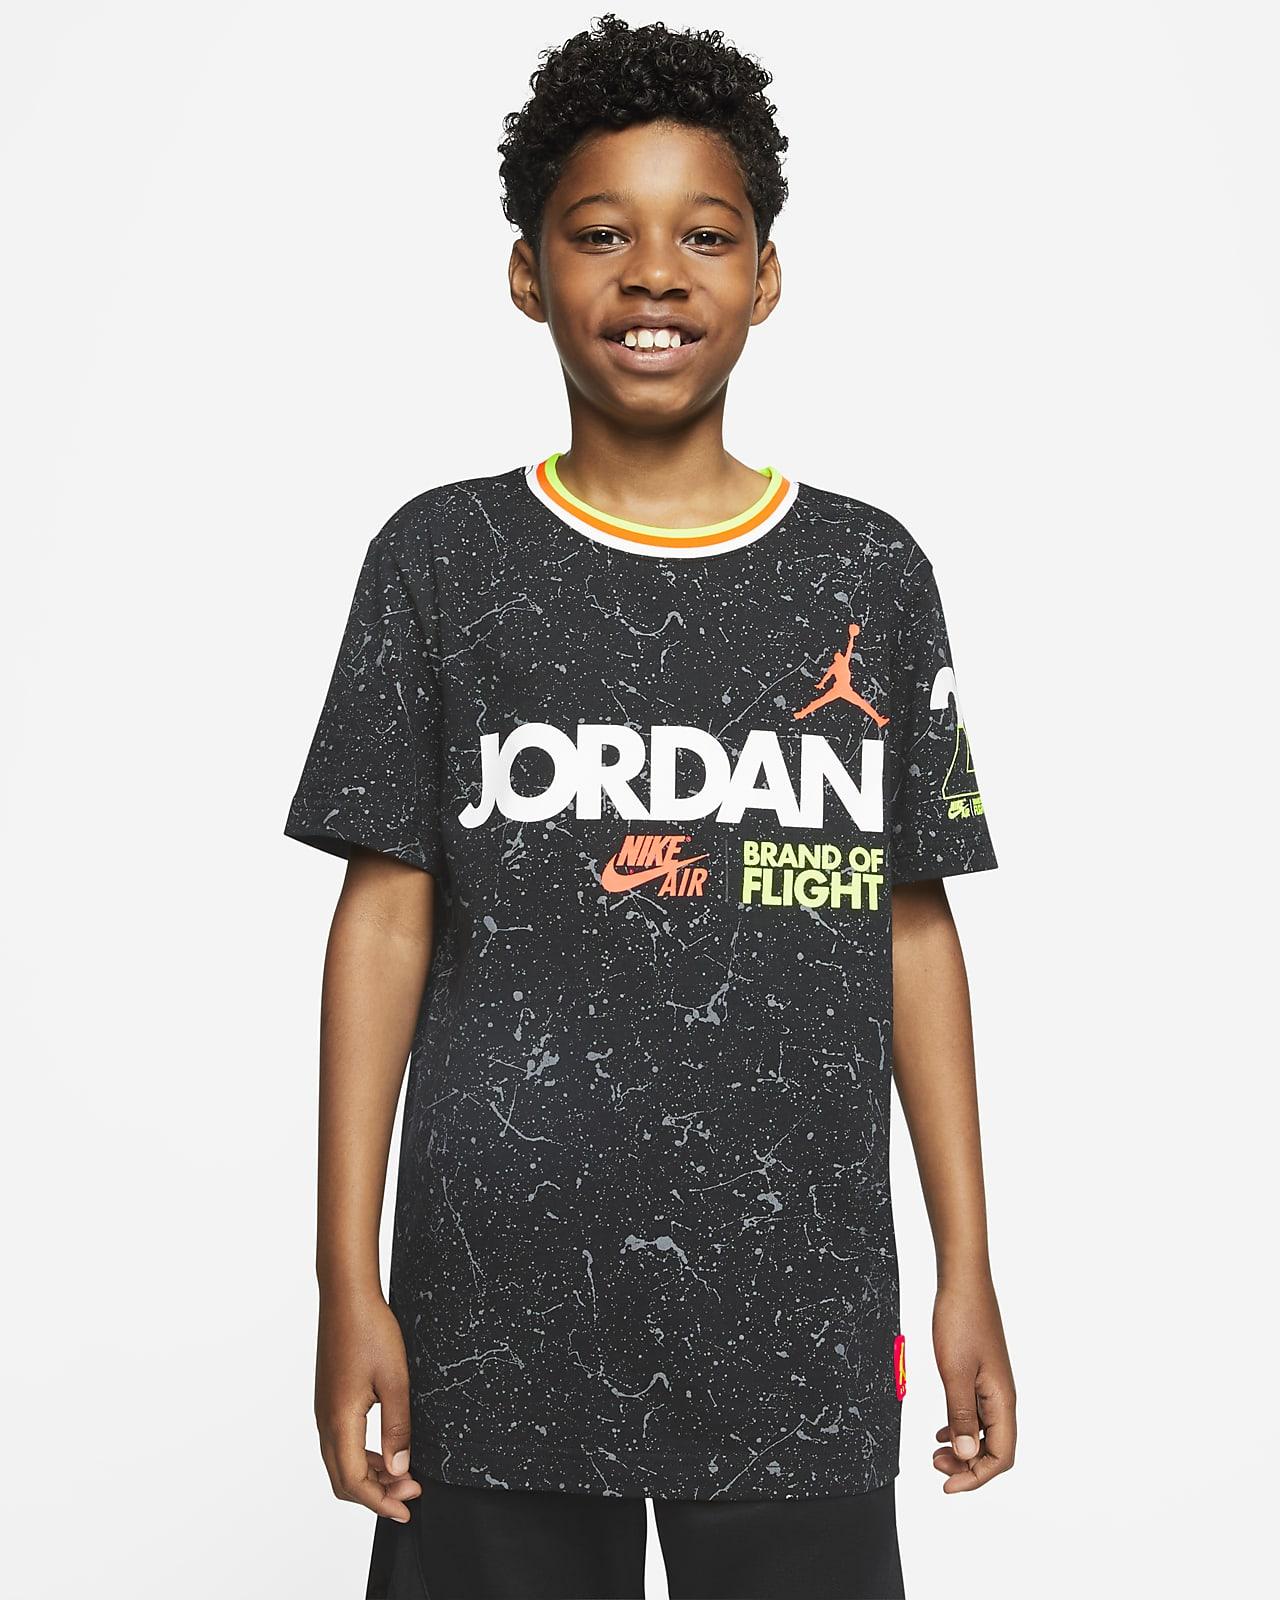 Jordan Older Kids' (Boys') T-Shirt